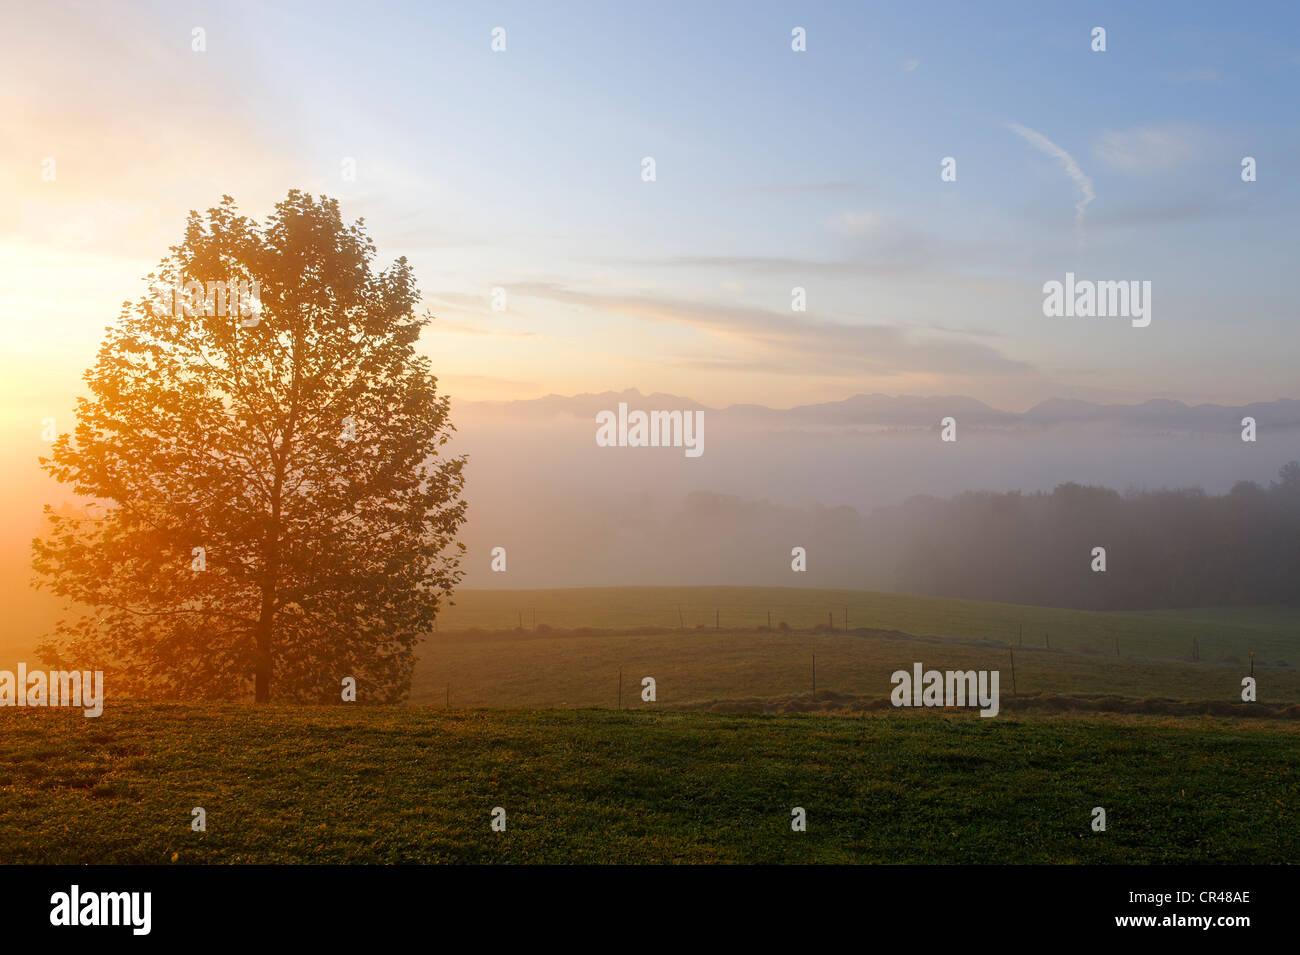 Morning mist from Aschbacher Berg mountain, Feldkirchen-Westerham in front of Wendelstein and Schliersee mountains - Stock Image